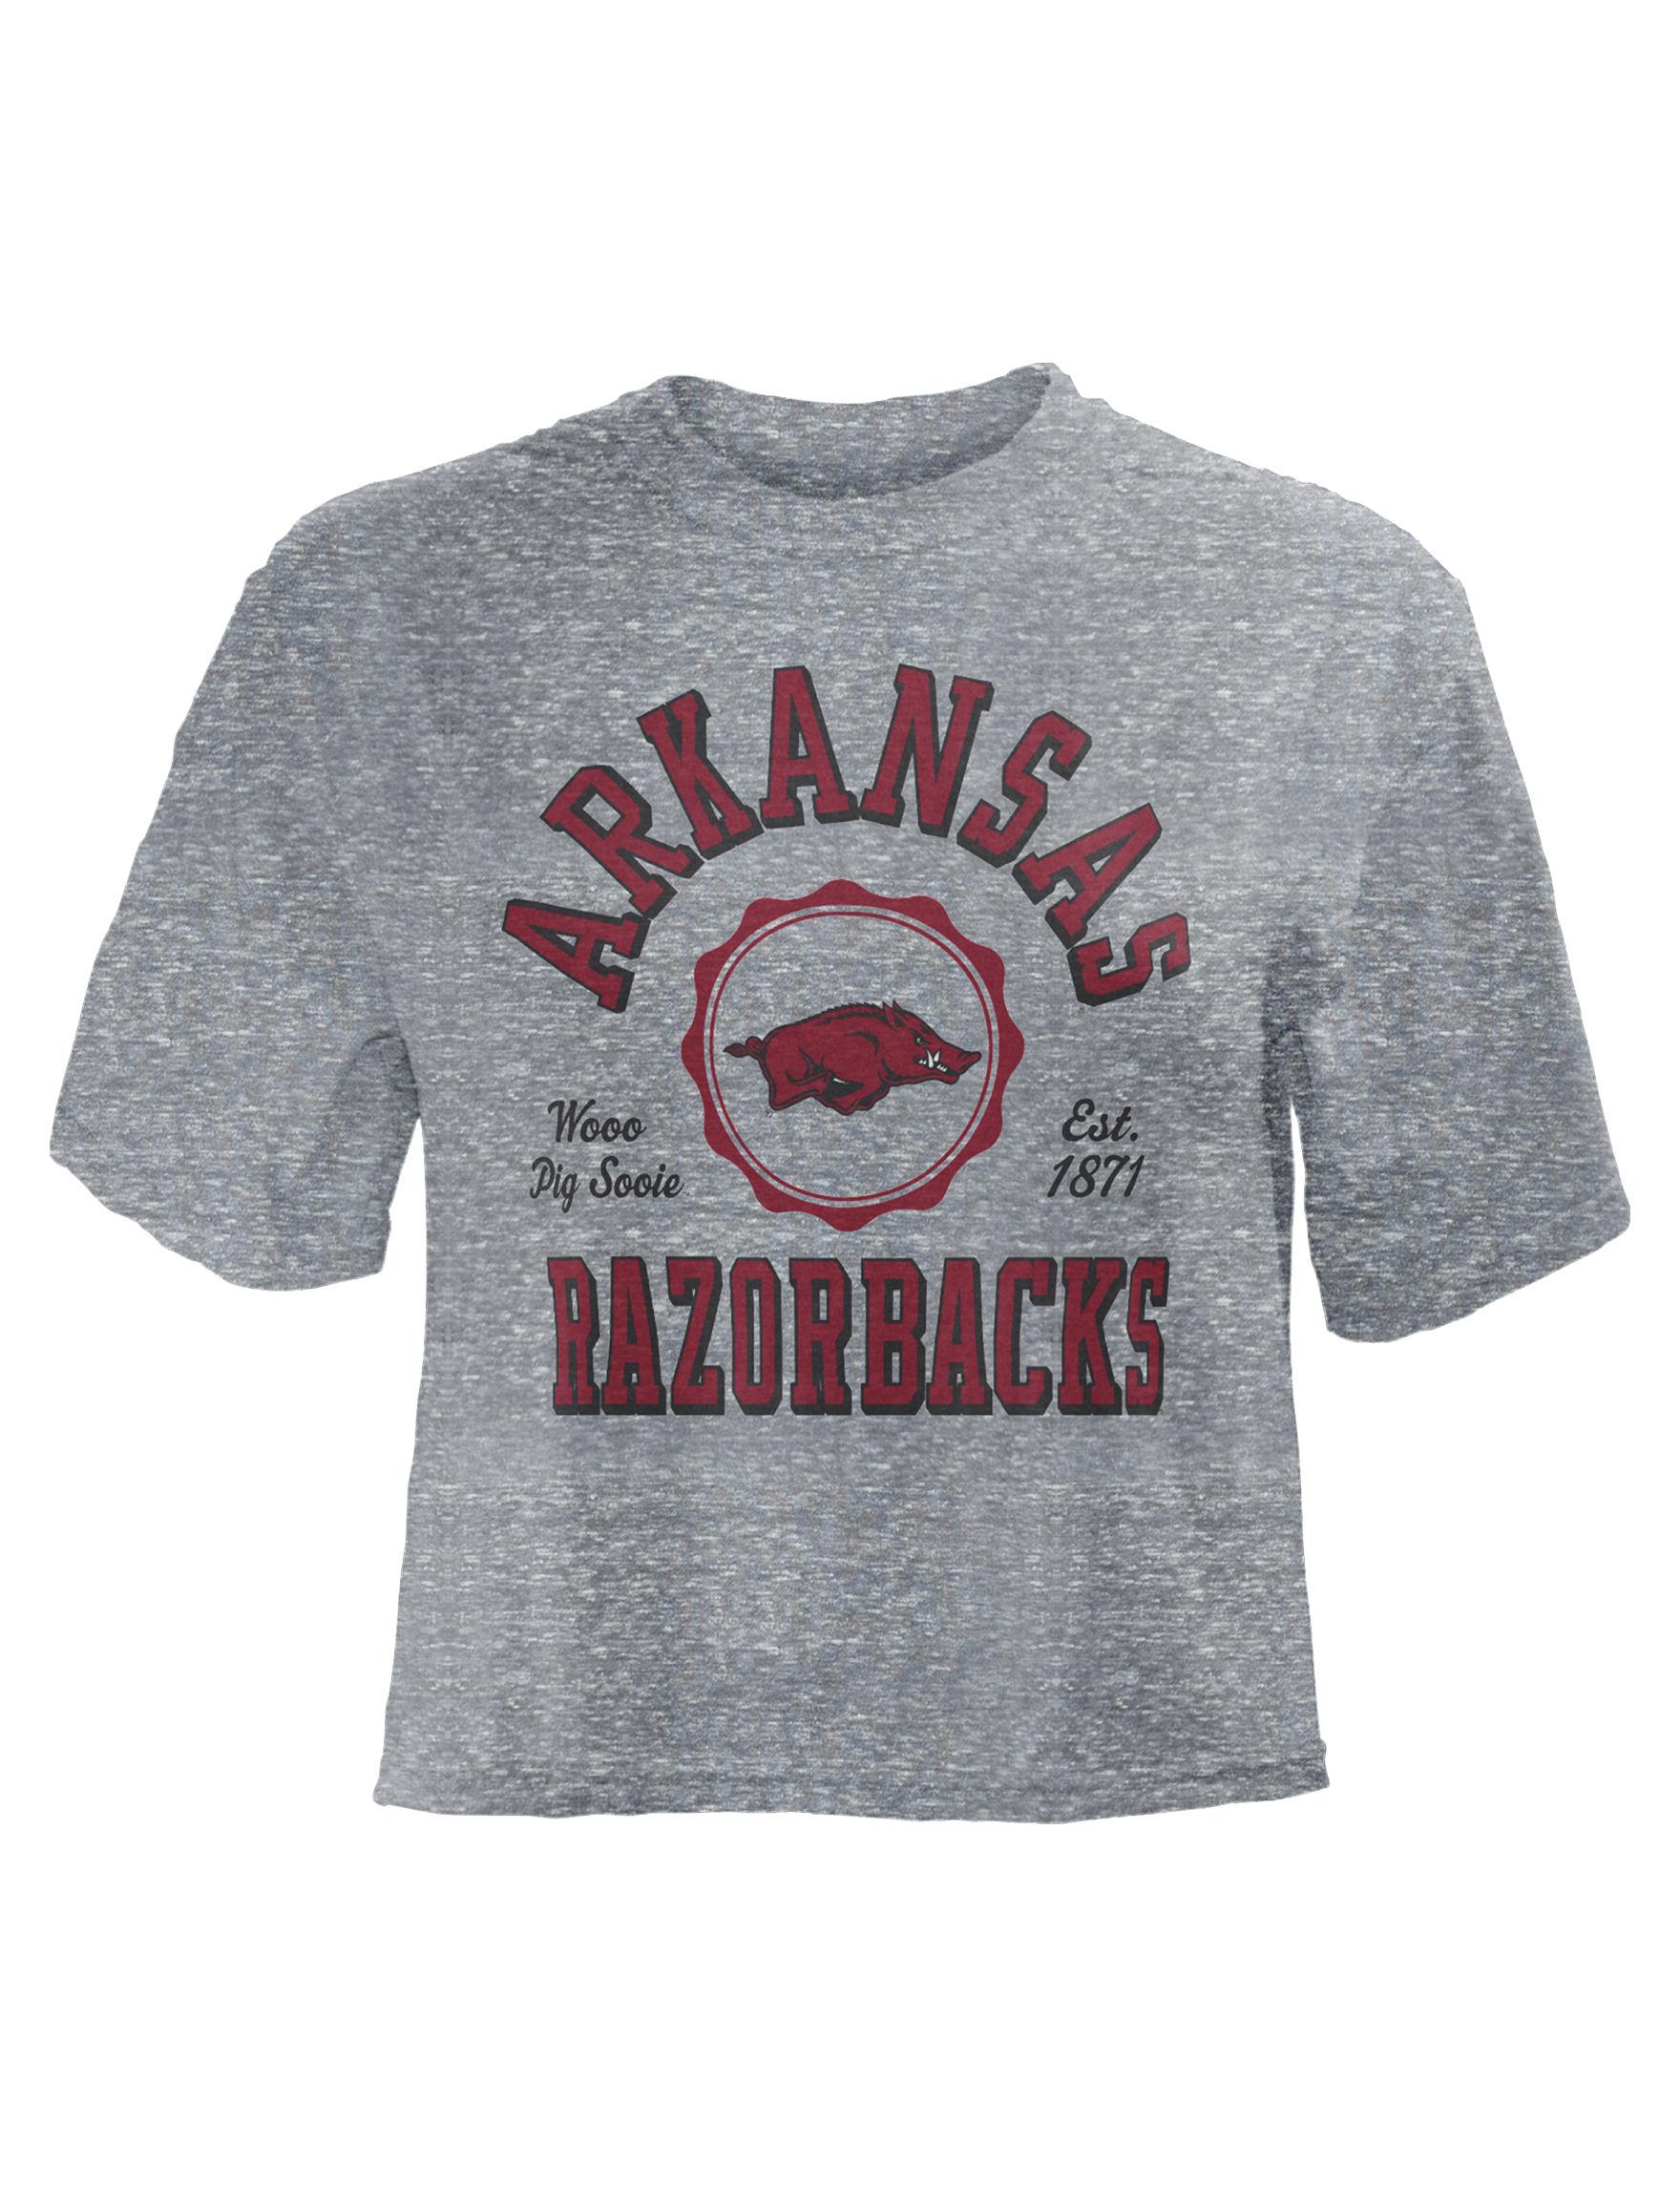 NCAA Grey / Red Tees & Tanks